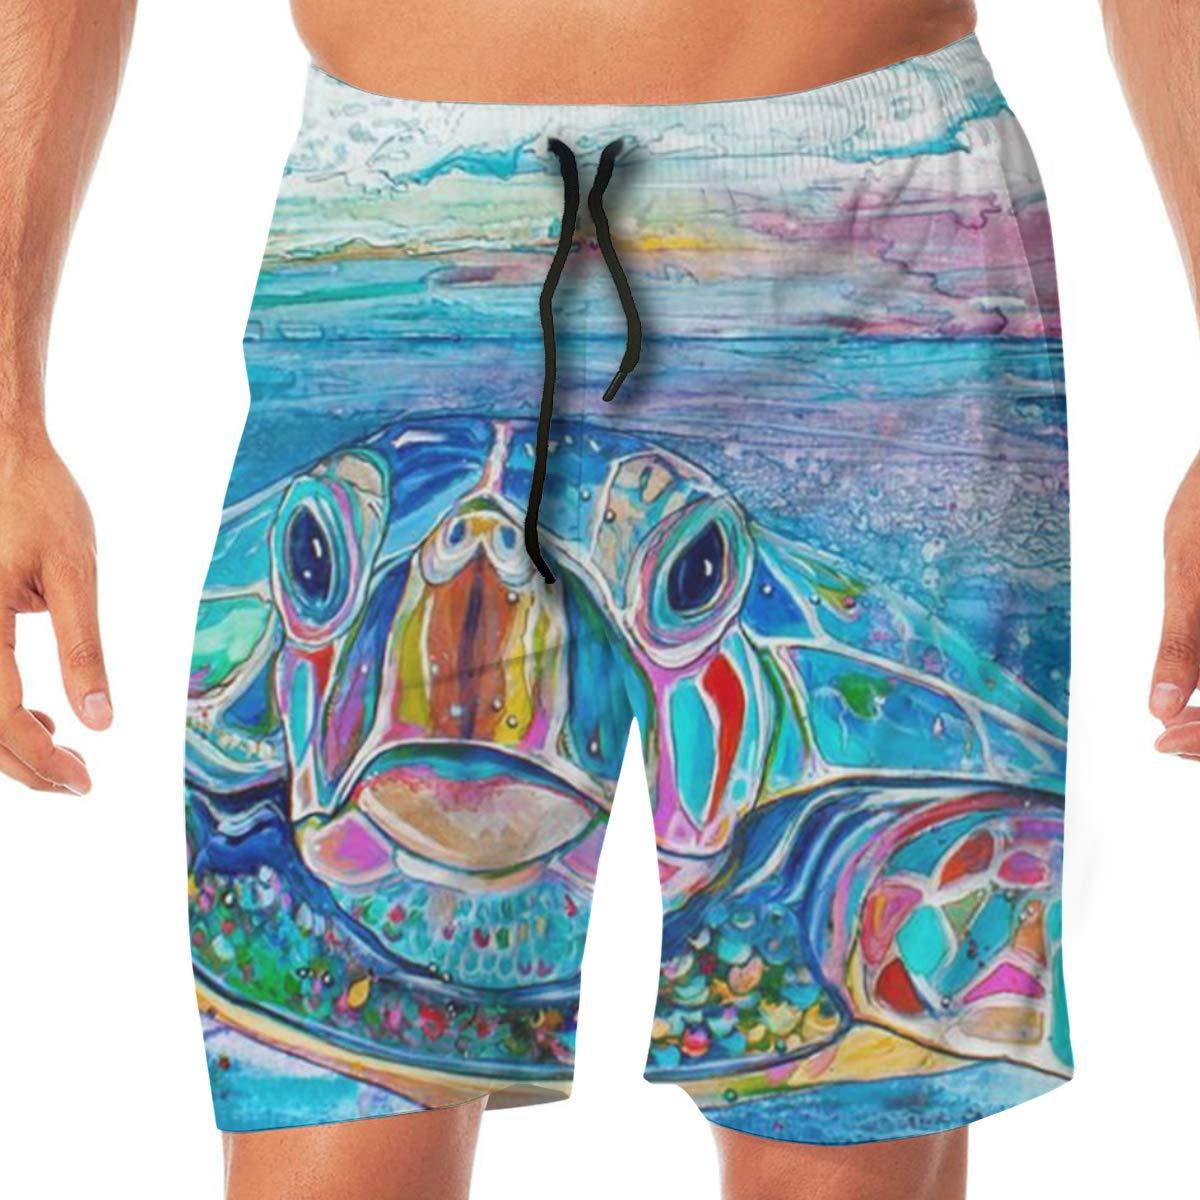 COLSHOORTS Sea Rubber Duck Men Hawaiian Boardshorts Quick Dry Swimming 3D Printed Elastic Beach Trunks Aloha Short with Pocket